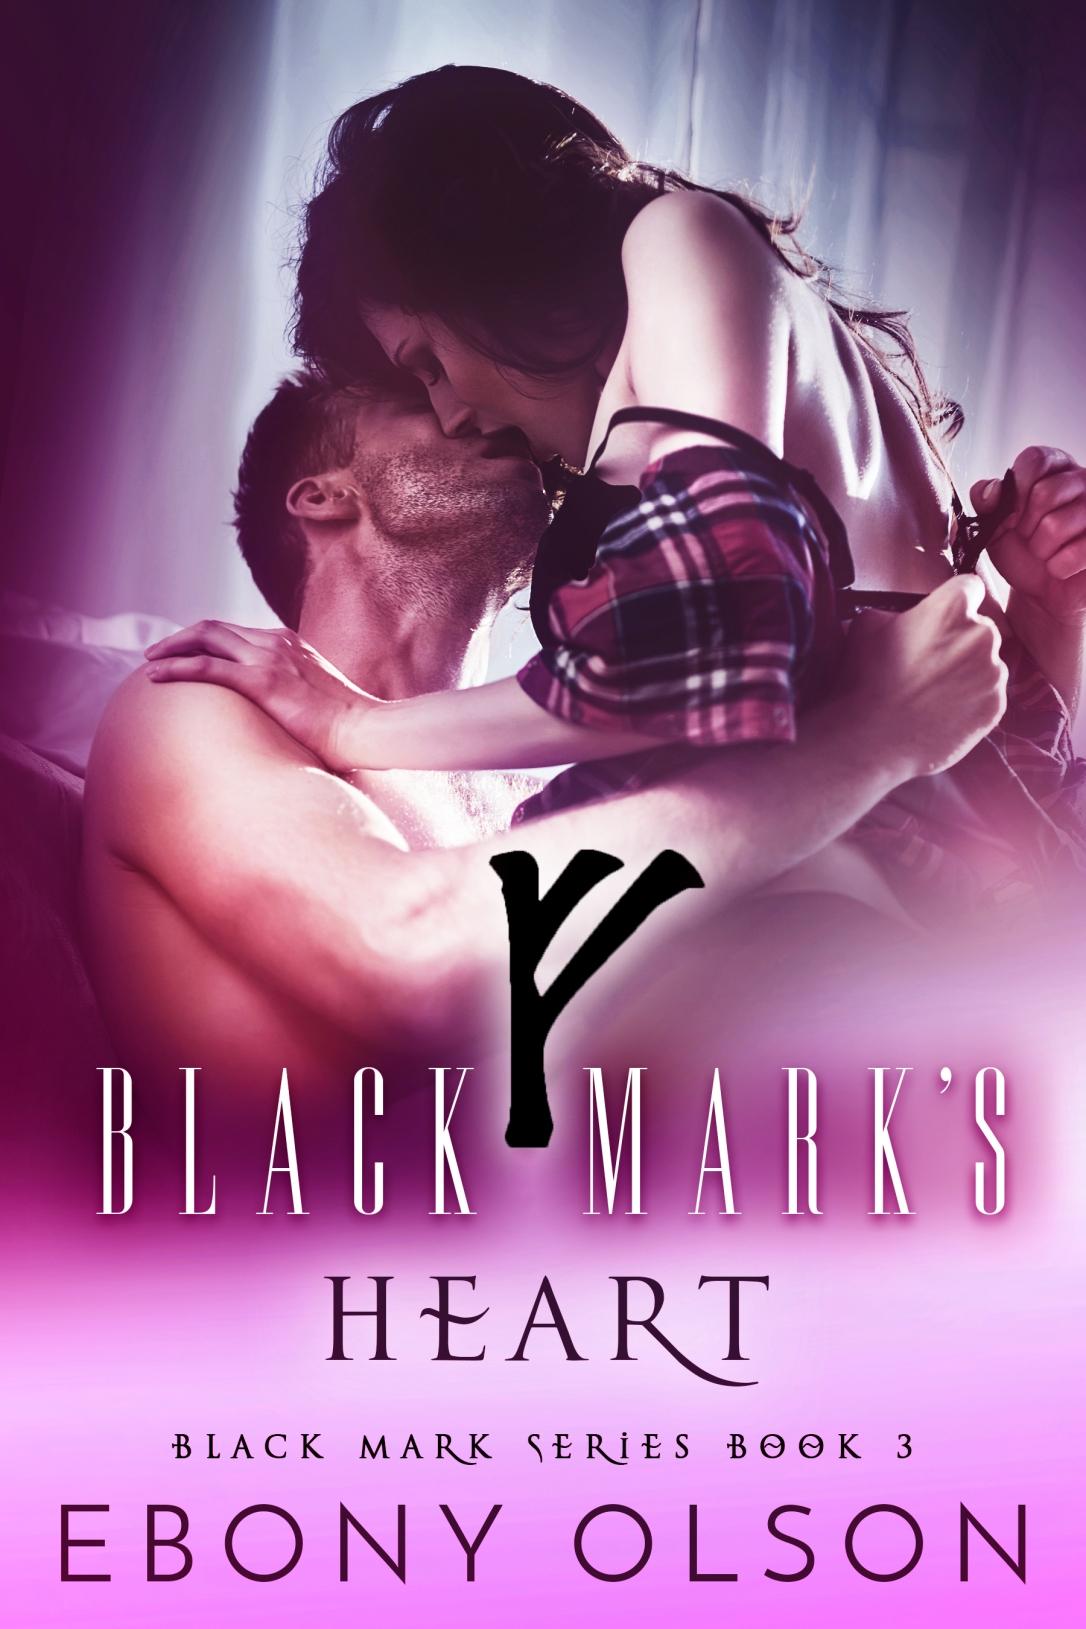 Black Mark_s Heart-v2 - Magenta